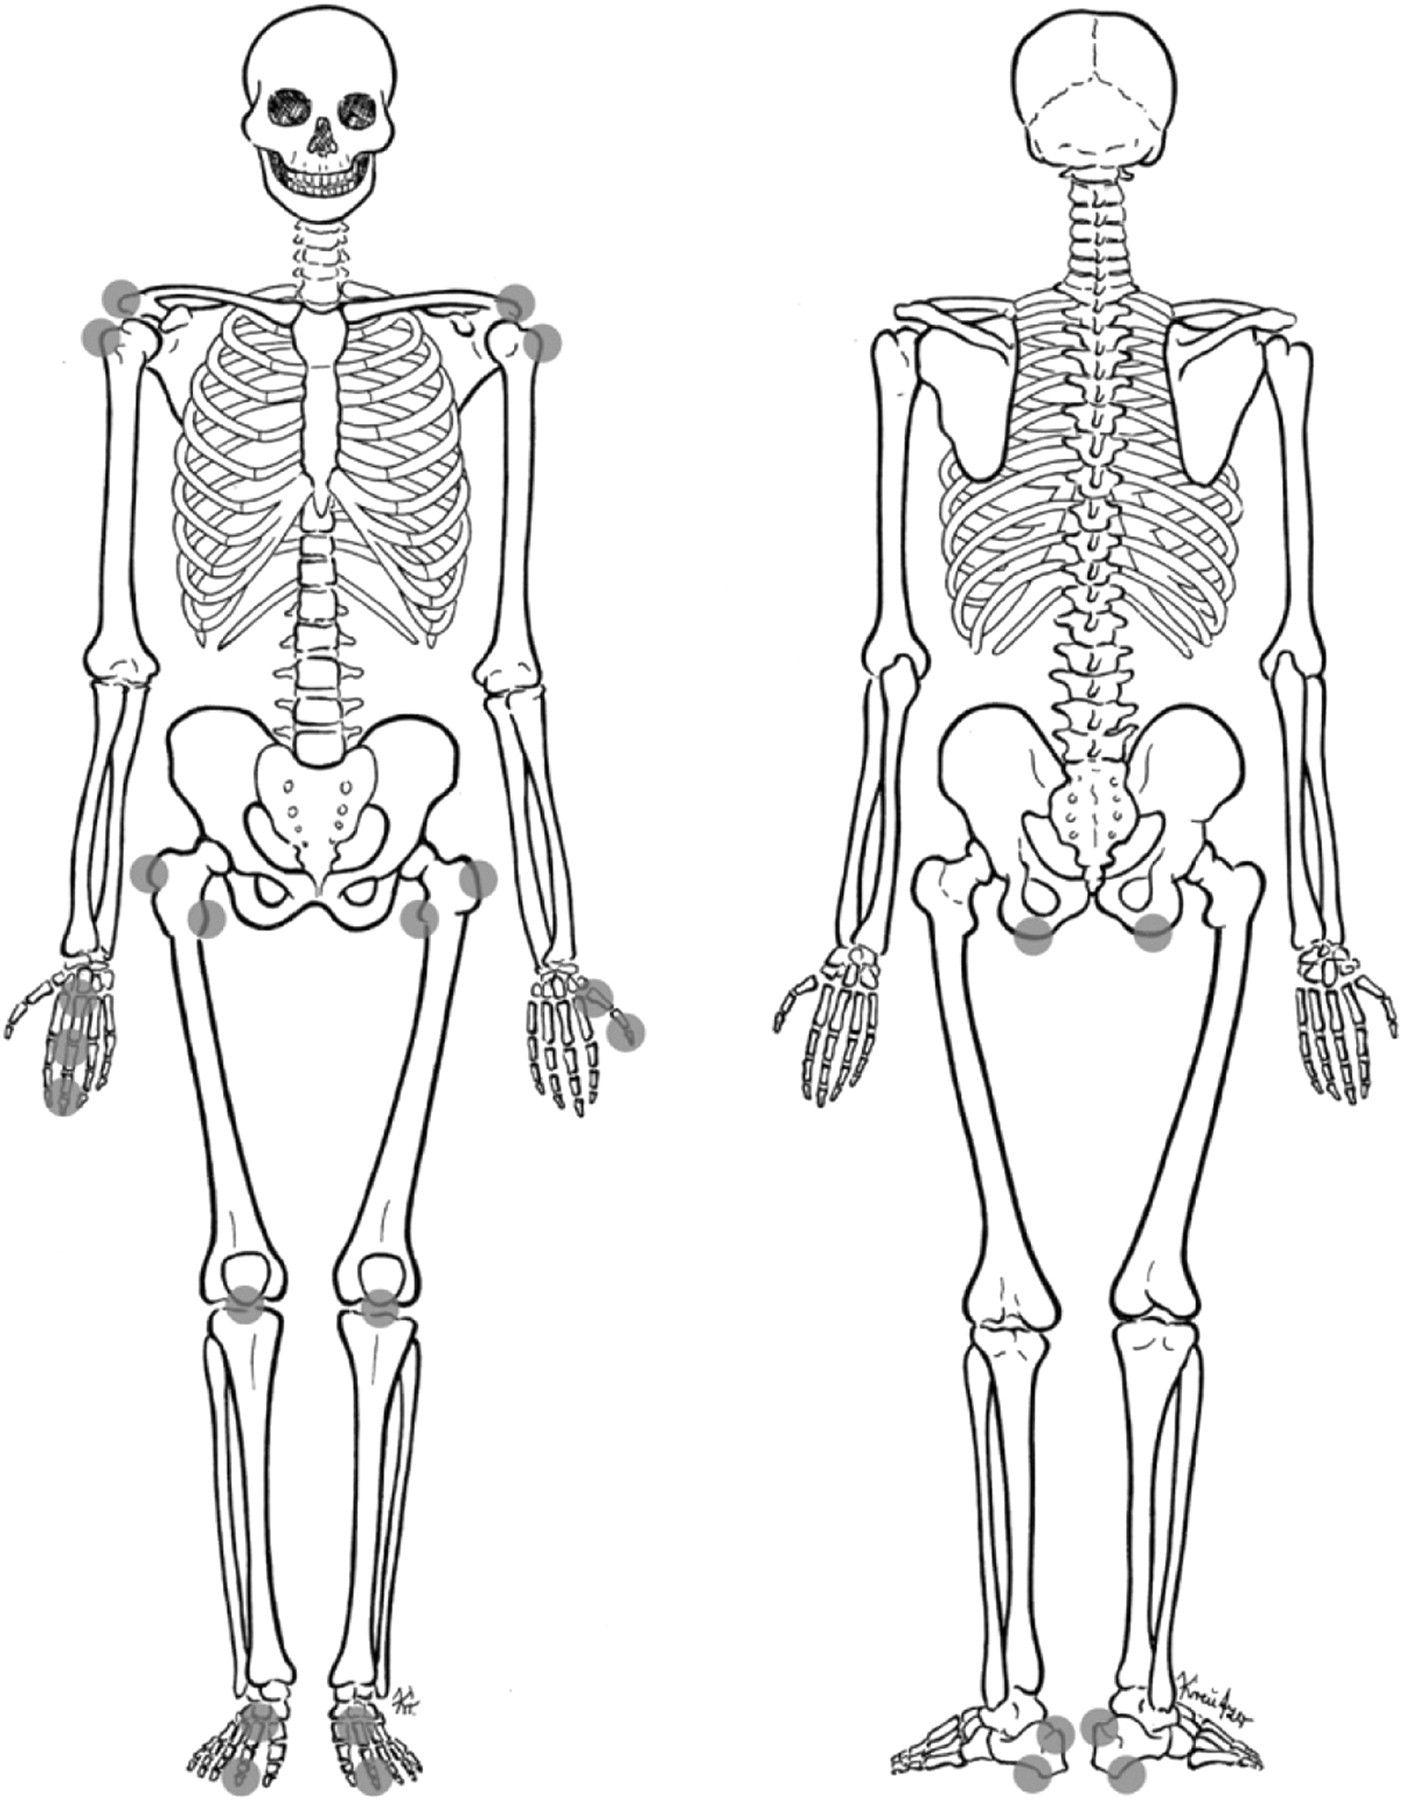 small resolution of unlabeled human skeleton diagram unlabeled human skeleton diagram labeled diagram of skeletal system printable human